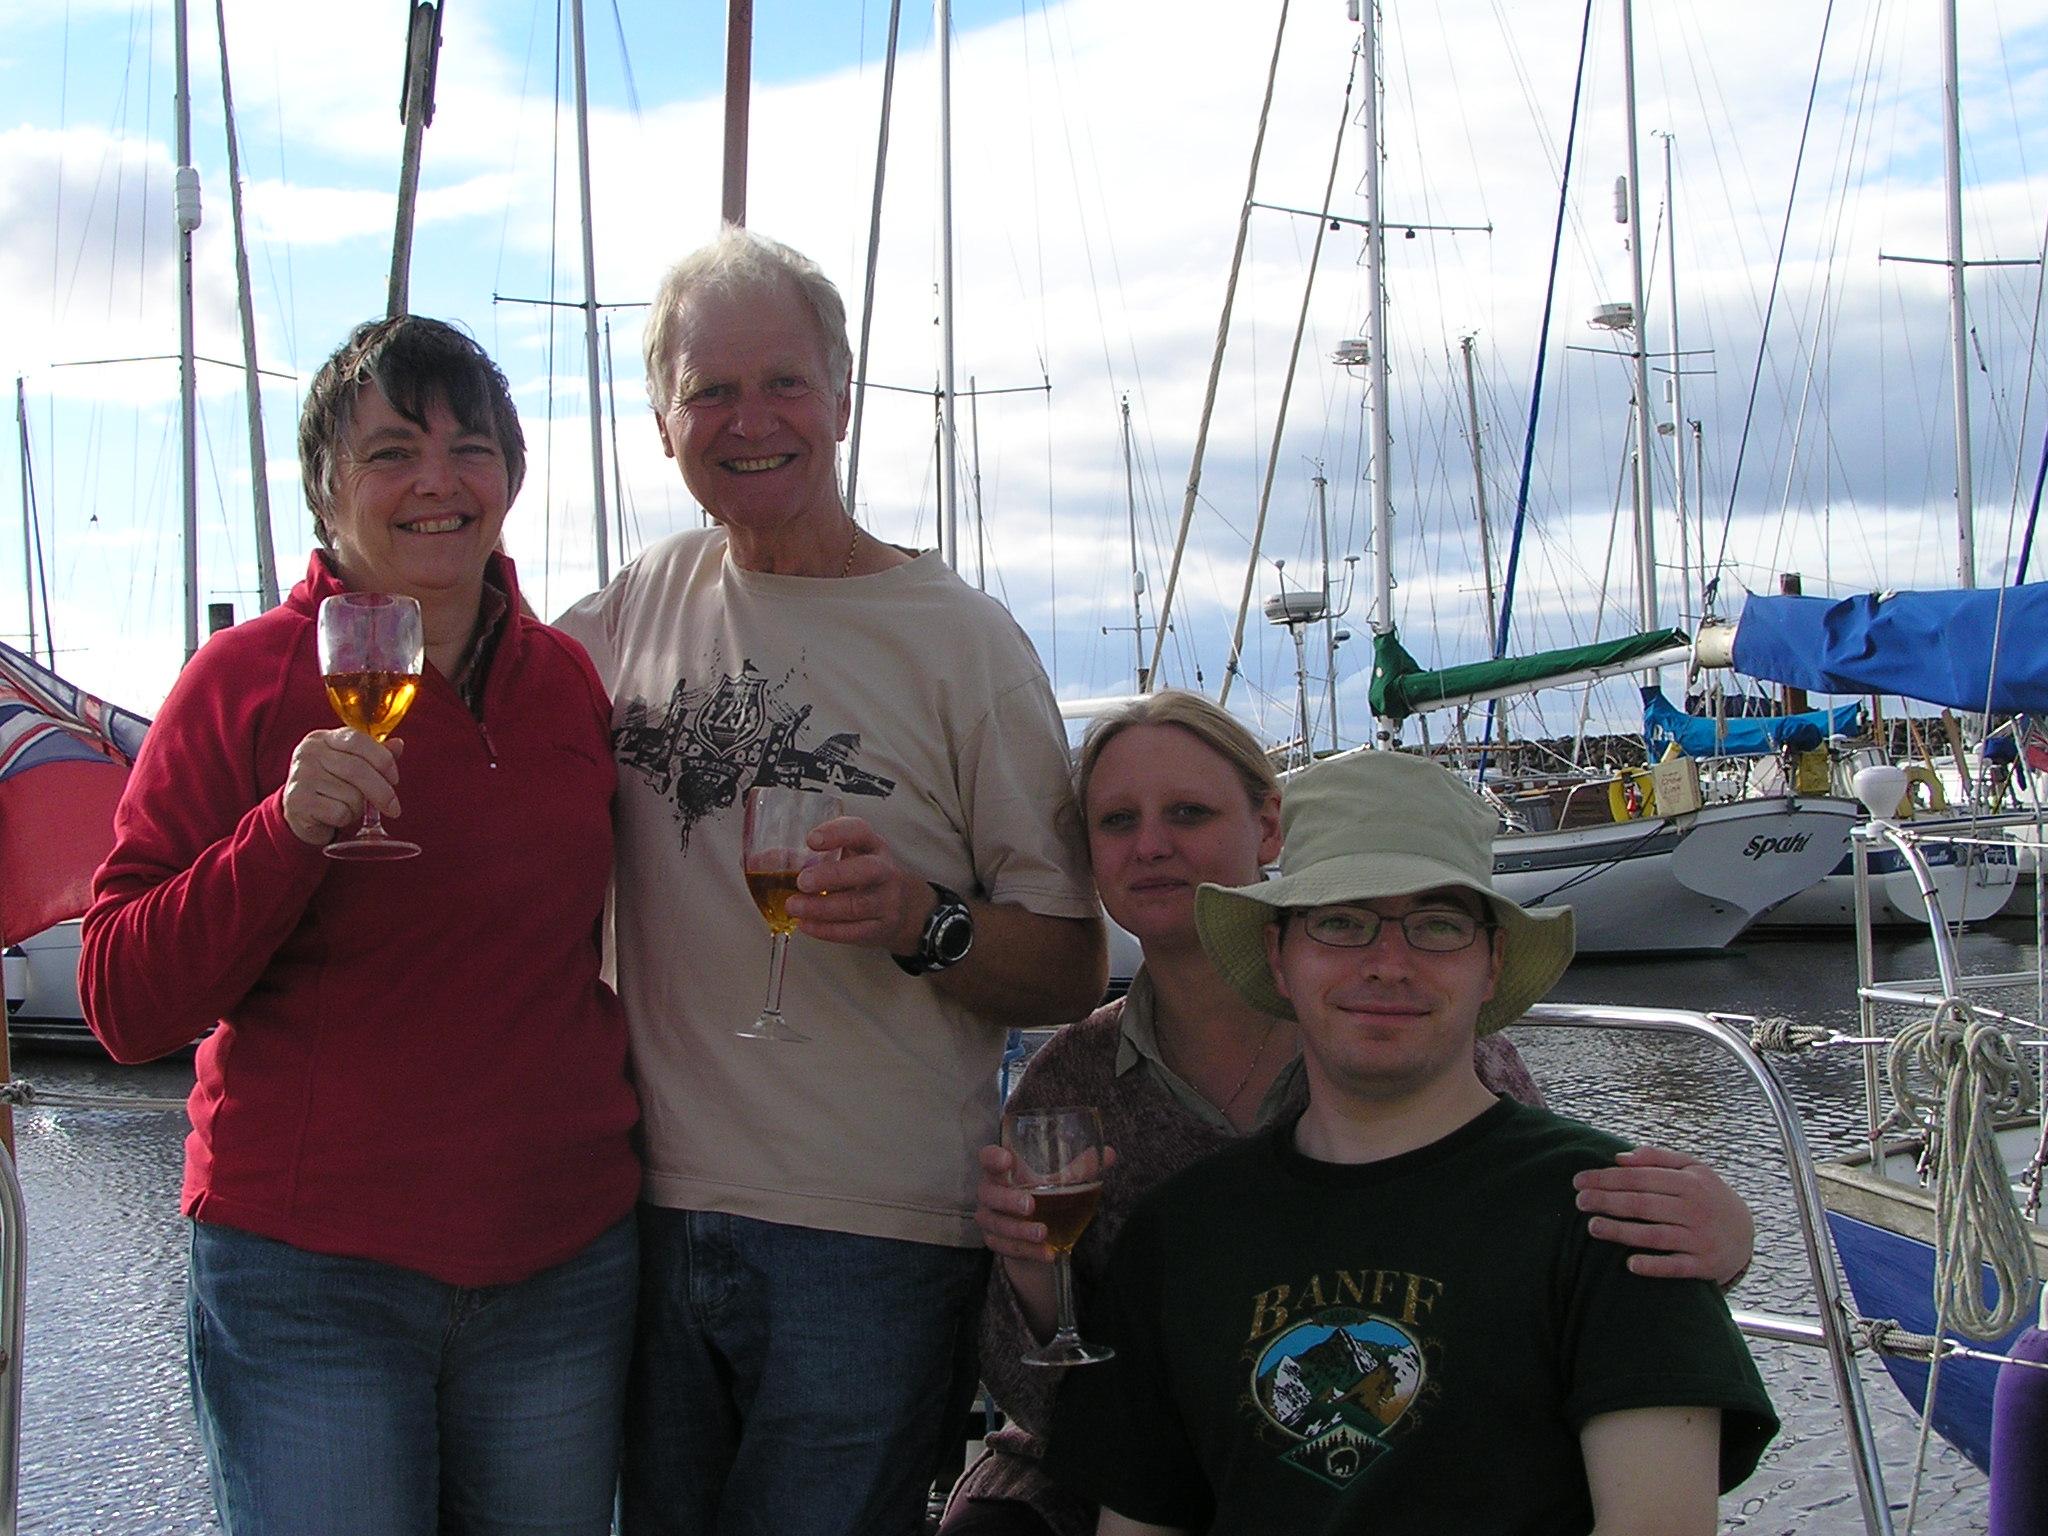 Liz, Ray, Sarah and Chris.  Northshields to Amble.